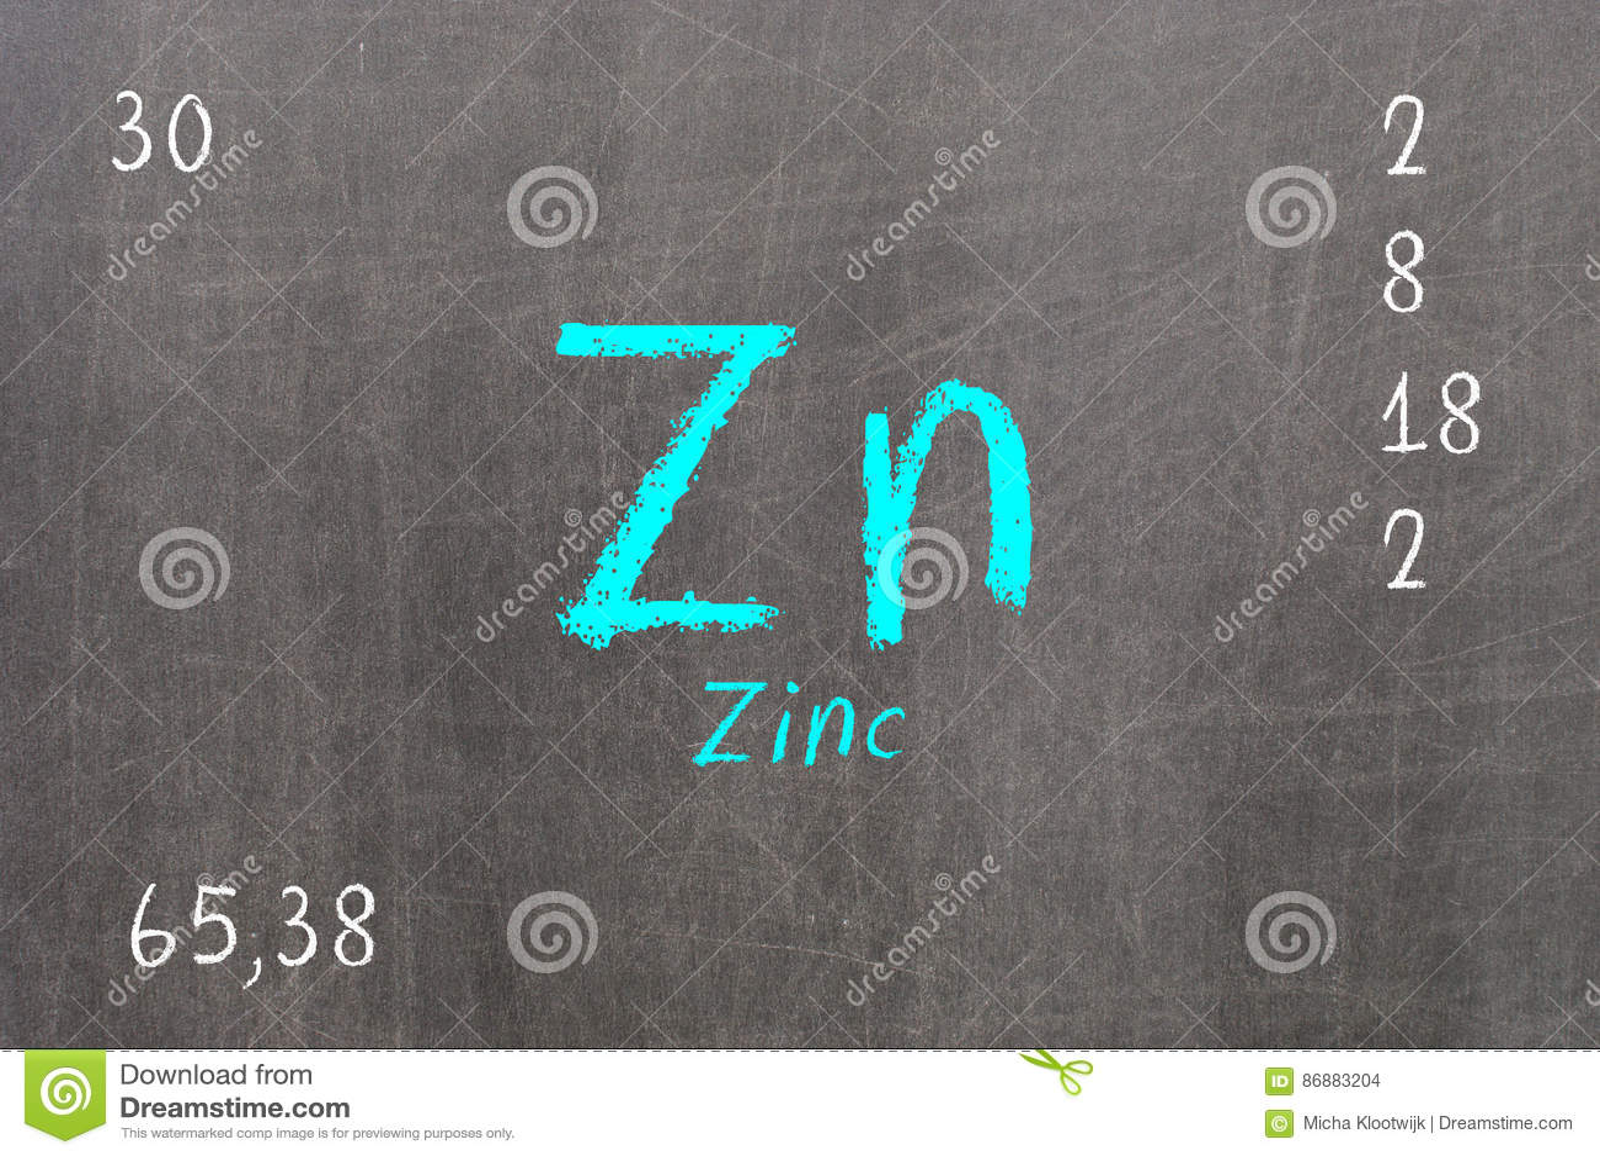 Periodic table zinc choice image periodic table images periodic table zinc choice image periodic table images isolated blackboard with periodic table zinc stock illustration gamestrikefo Gallery